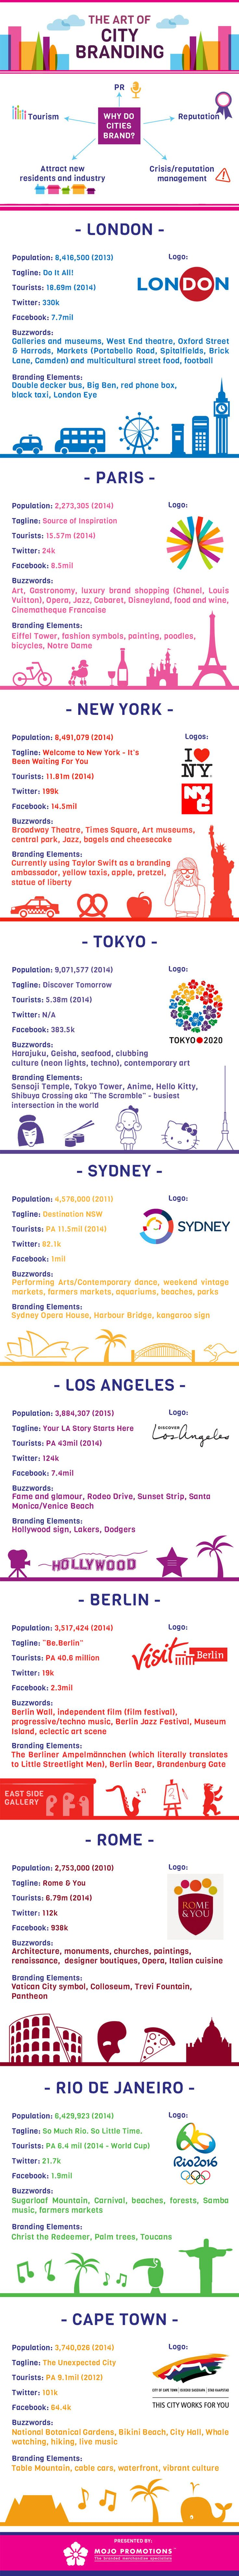 The Art of City Branding #infographic #Branding #Marketing